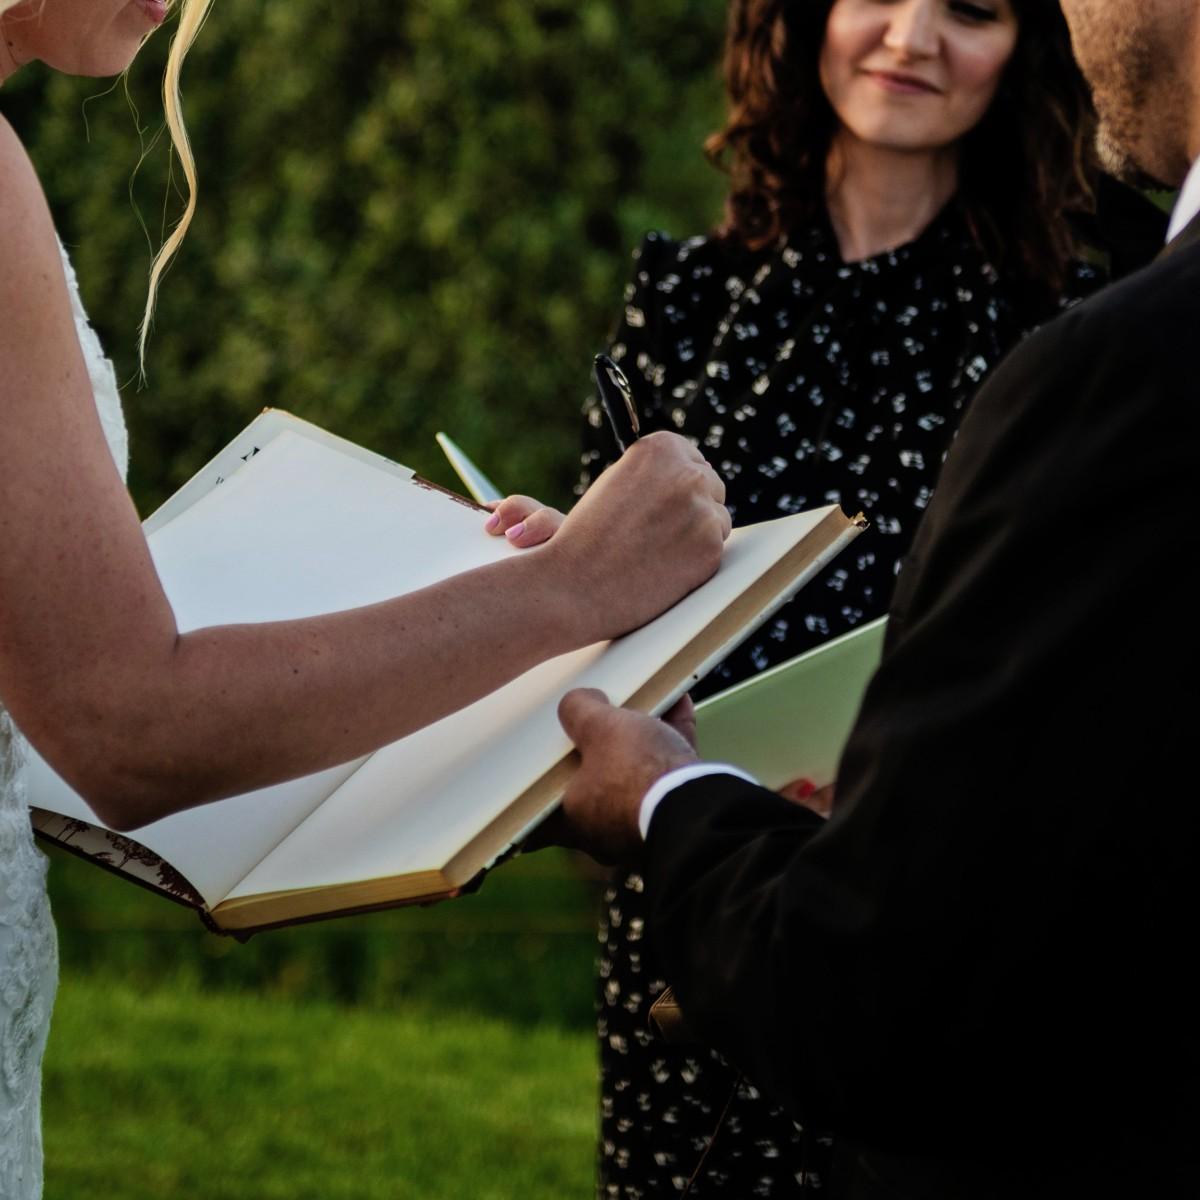 bride-groom-signing-blank-book-ceremony